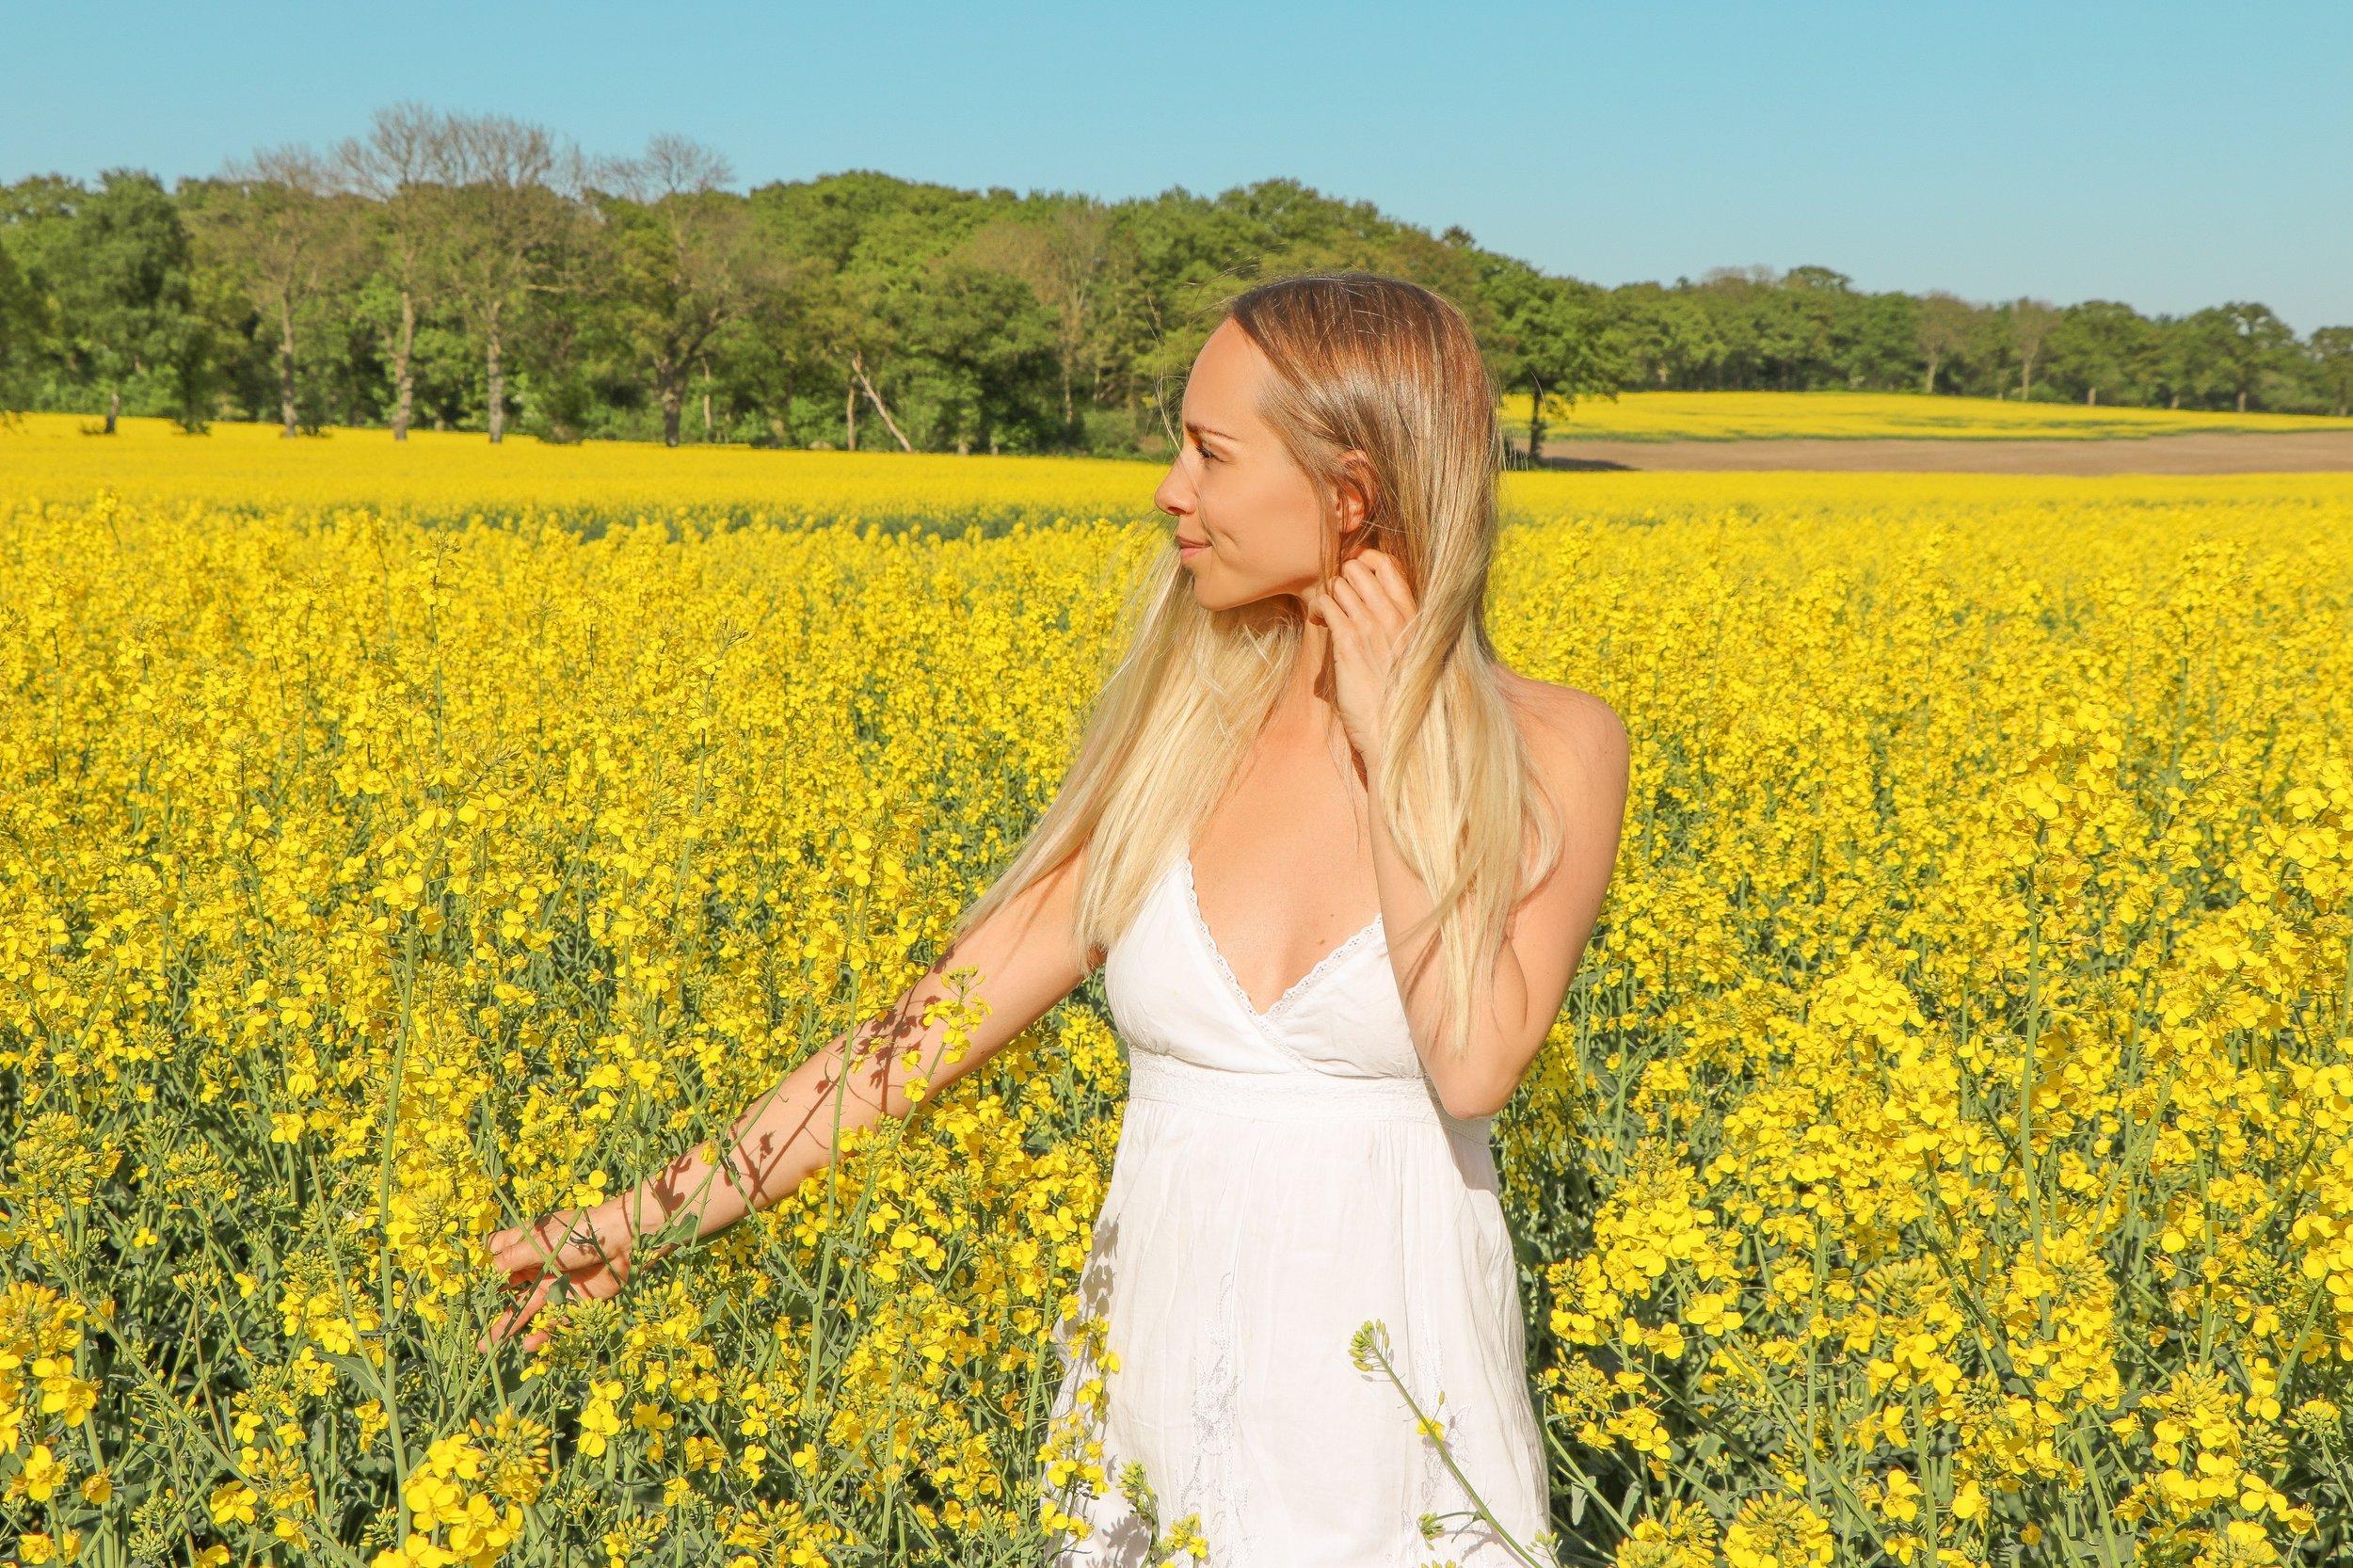 Swedish countryside and fields of gold photo Linda Haggh.jpg